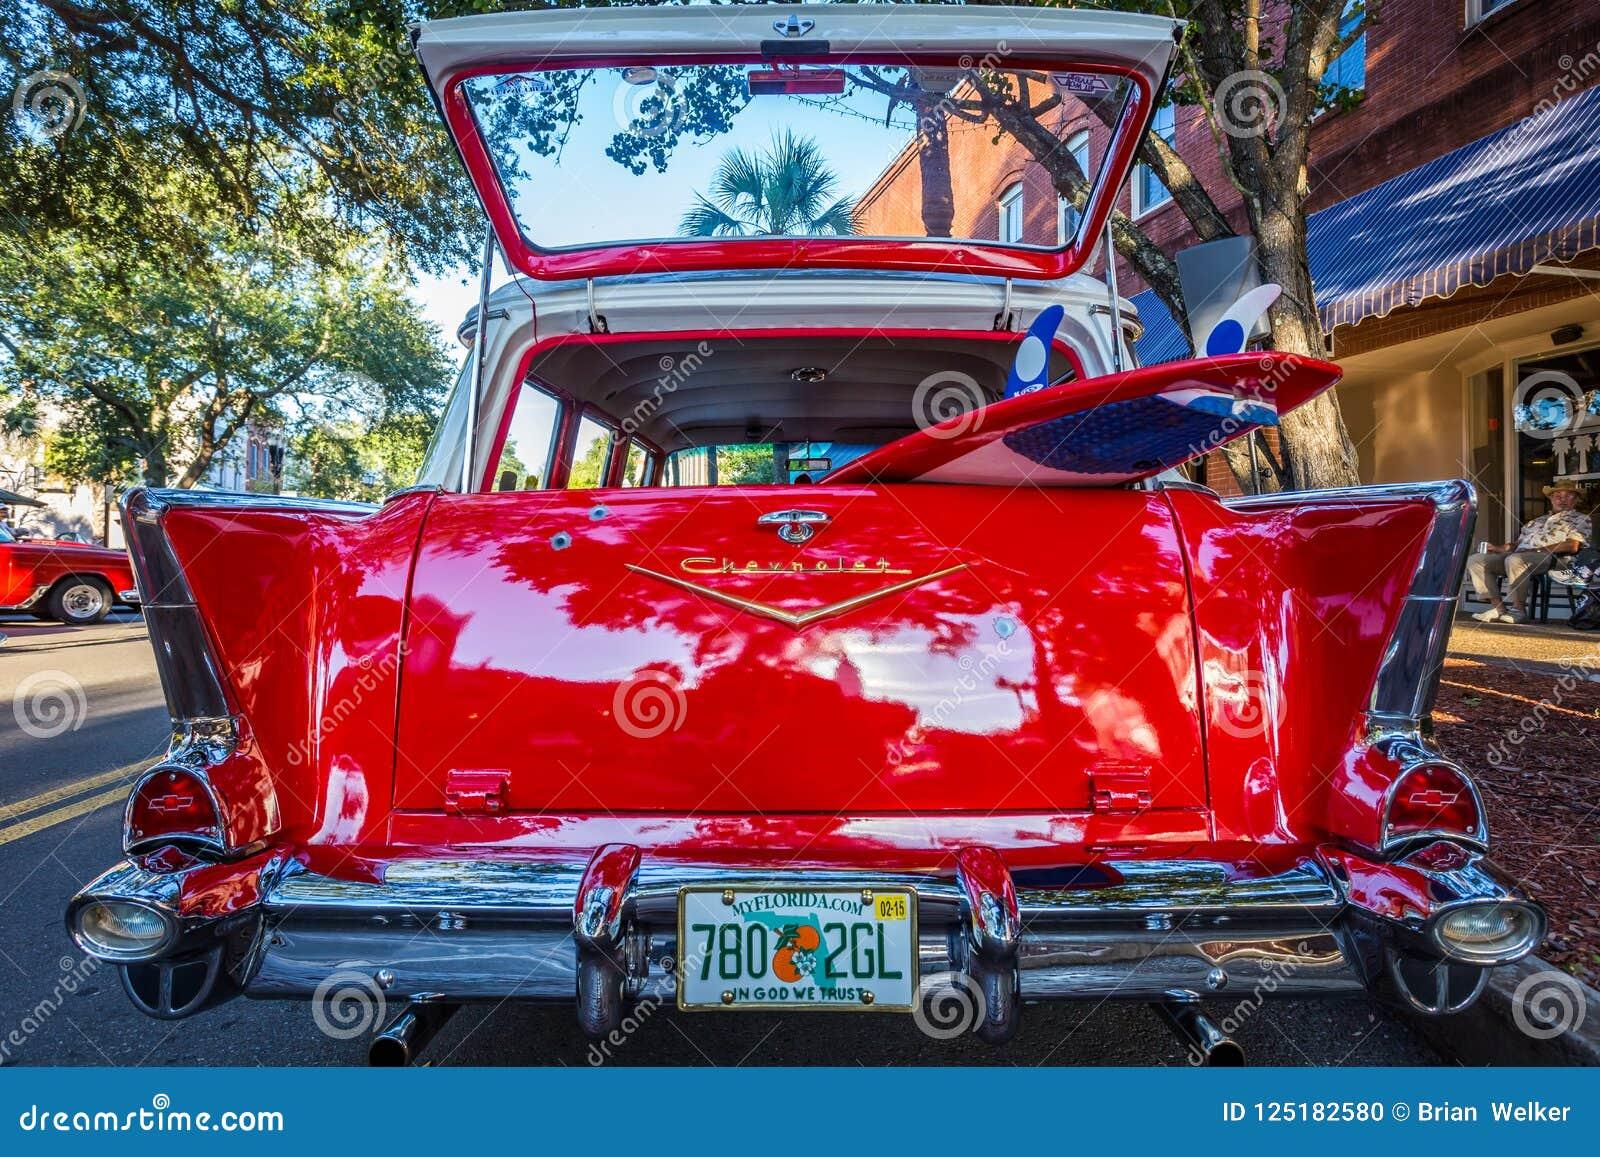 Chevrolet BelAir Station Wagon Editorial Image Image Of - Amelia island classic car show